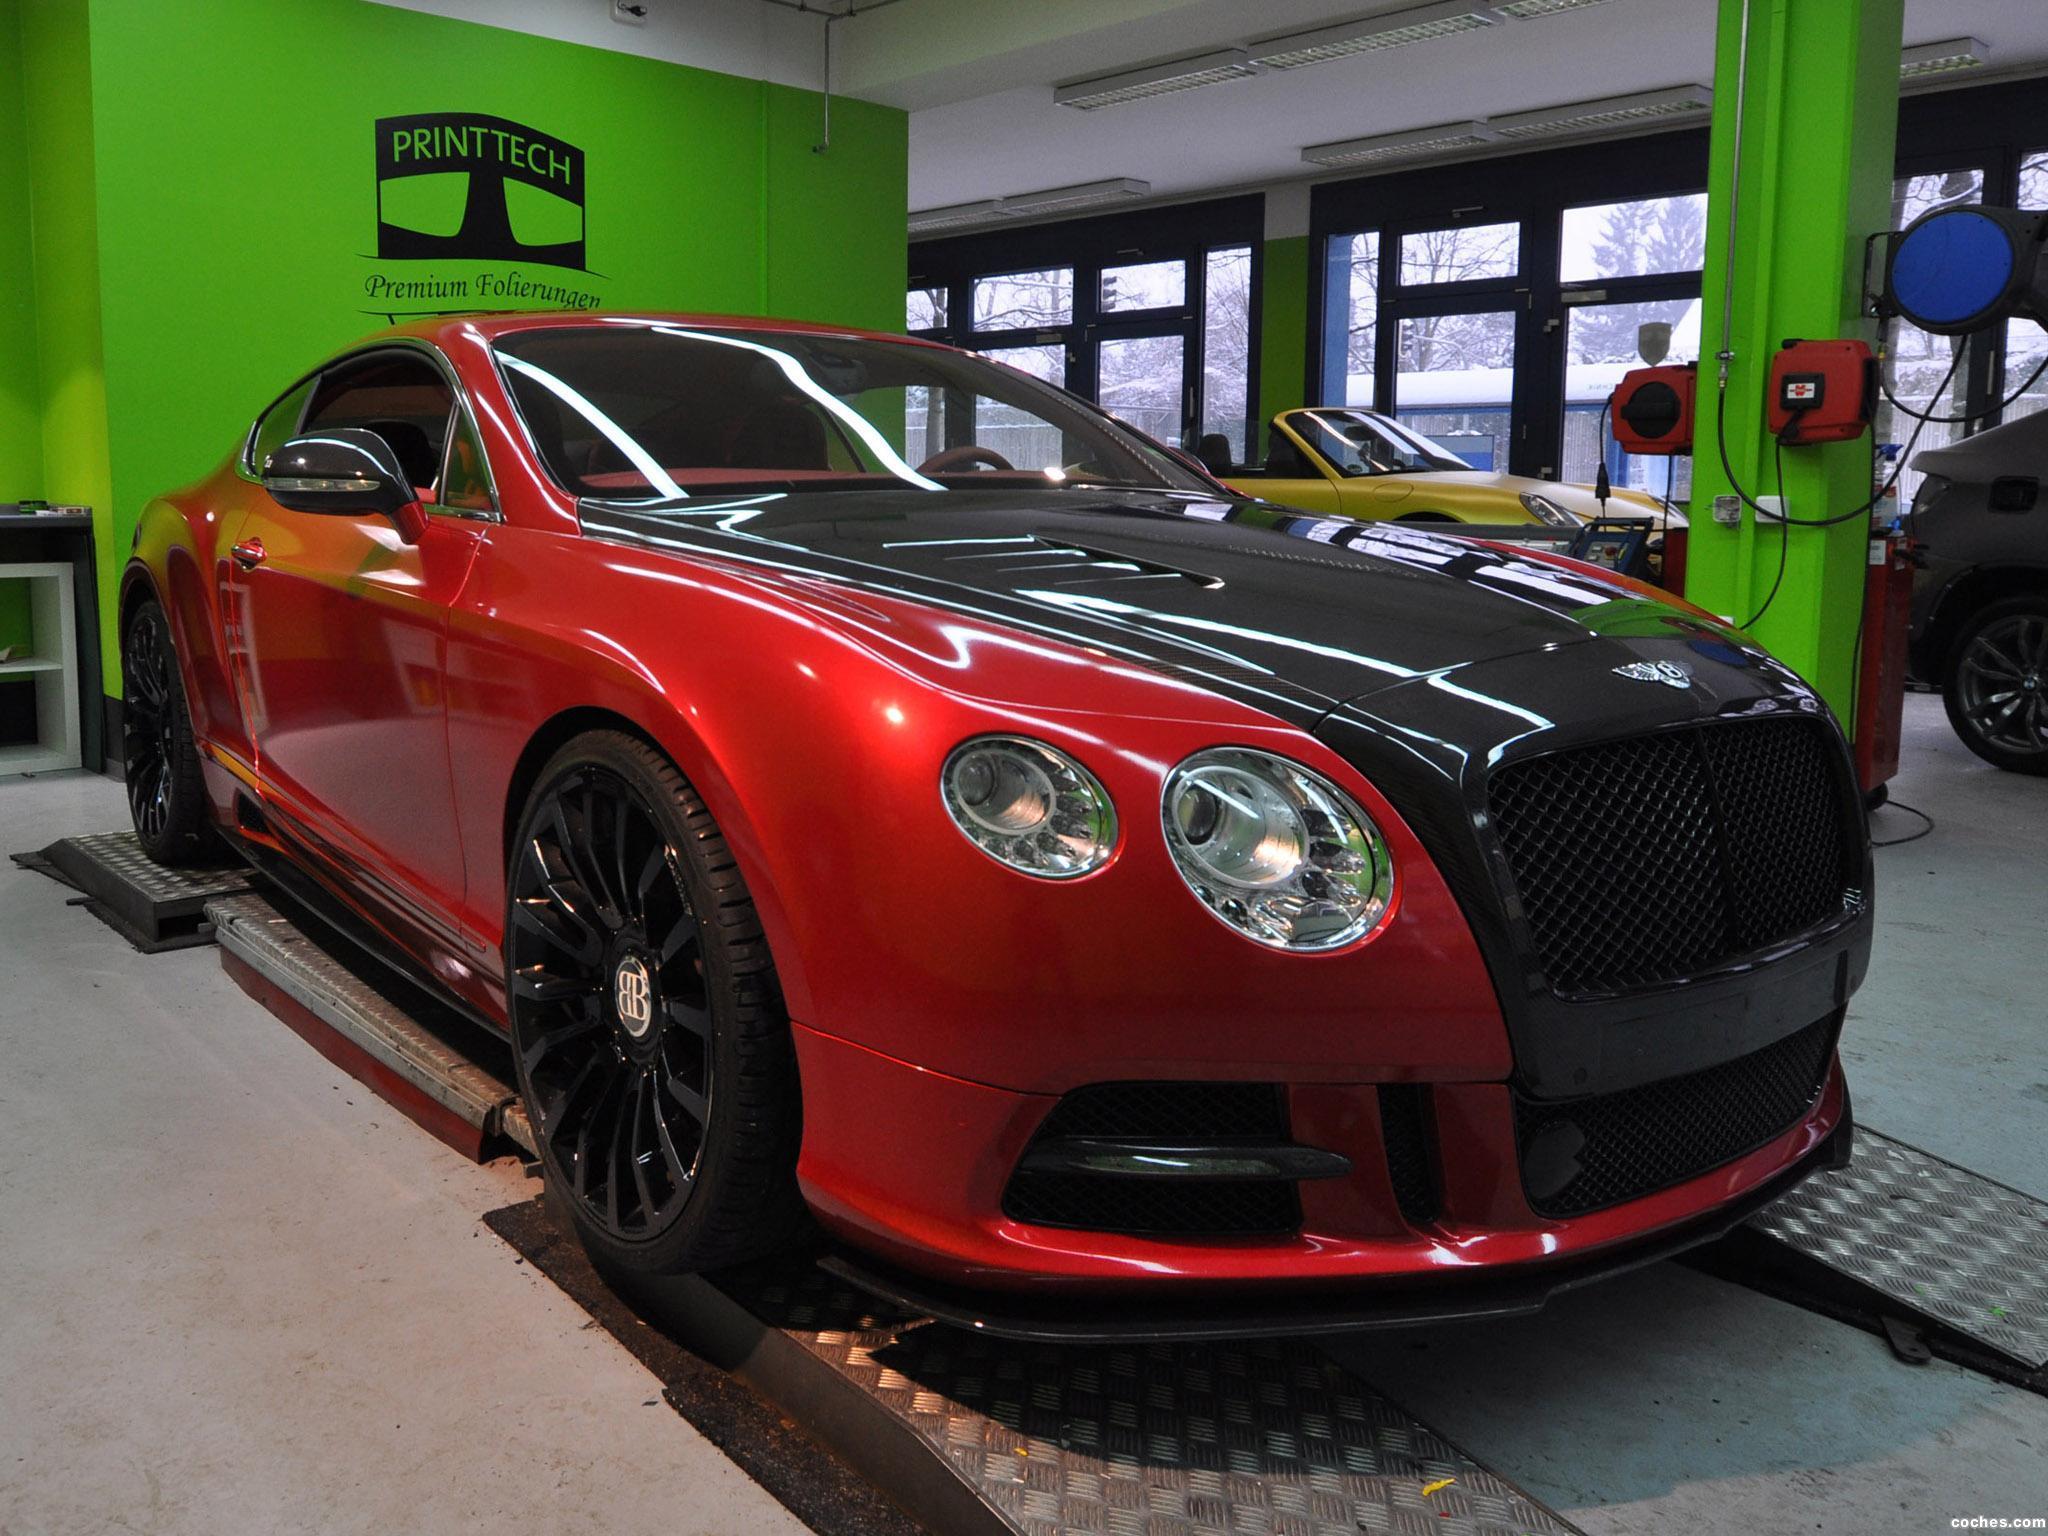 Foto 0 de Mansory Bentley Continental GT by Print Tech 2013